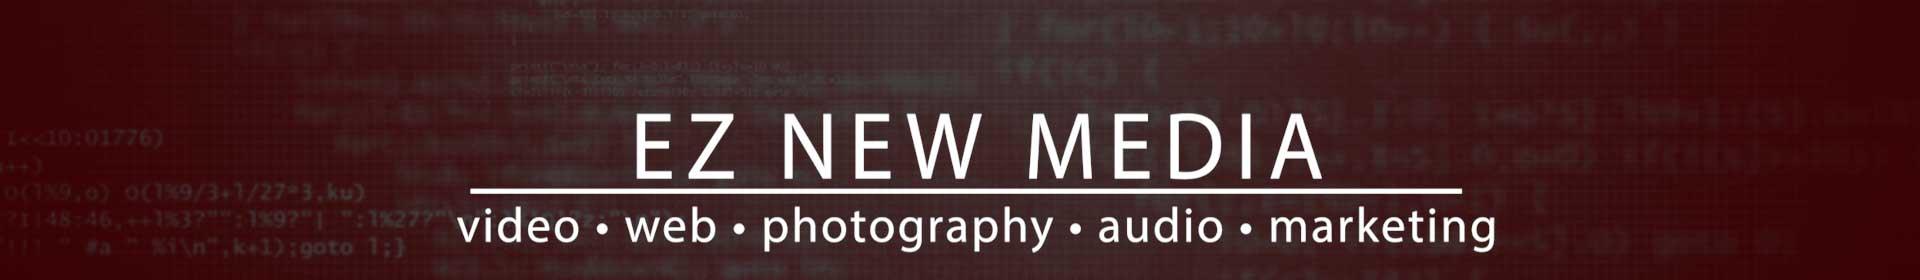 EZ New-Media - video production, website development, photography, audio production, marketing - Colfax, Eau Claire, Wisconsin